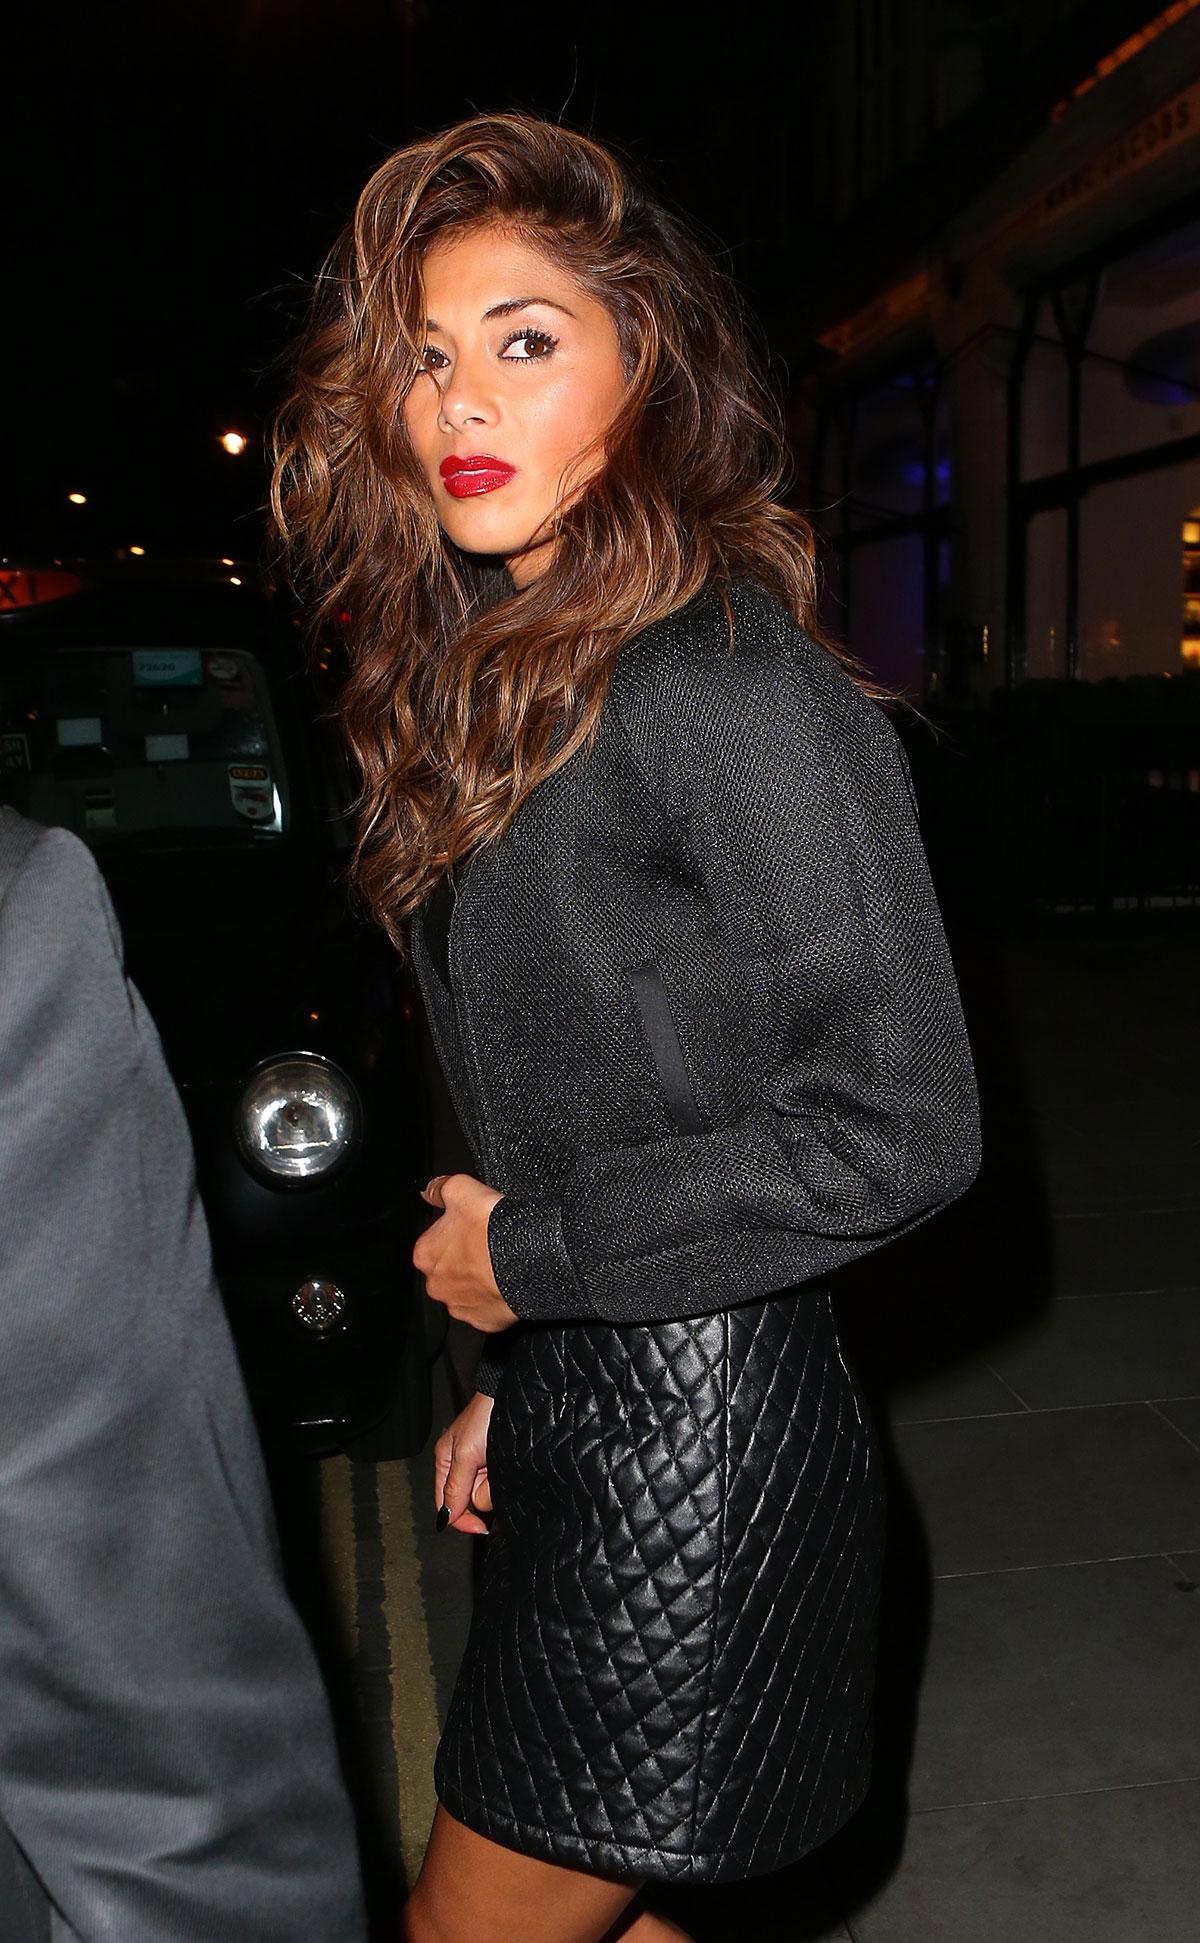 Nicole Scherzinger leaving Scotts Restaurant